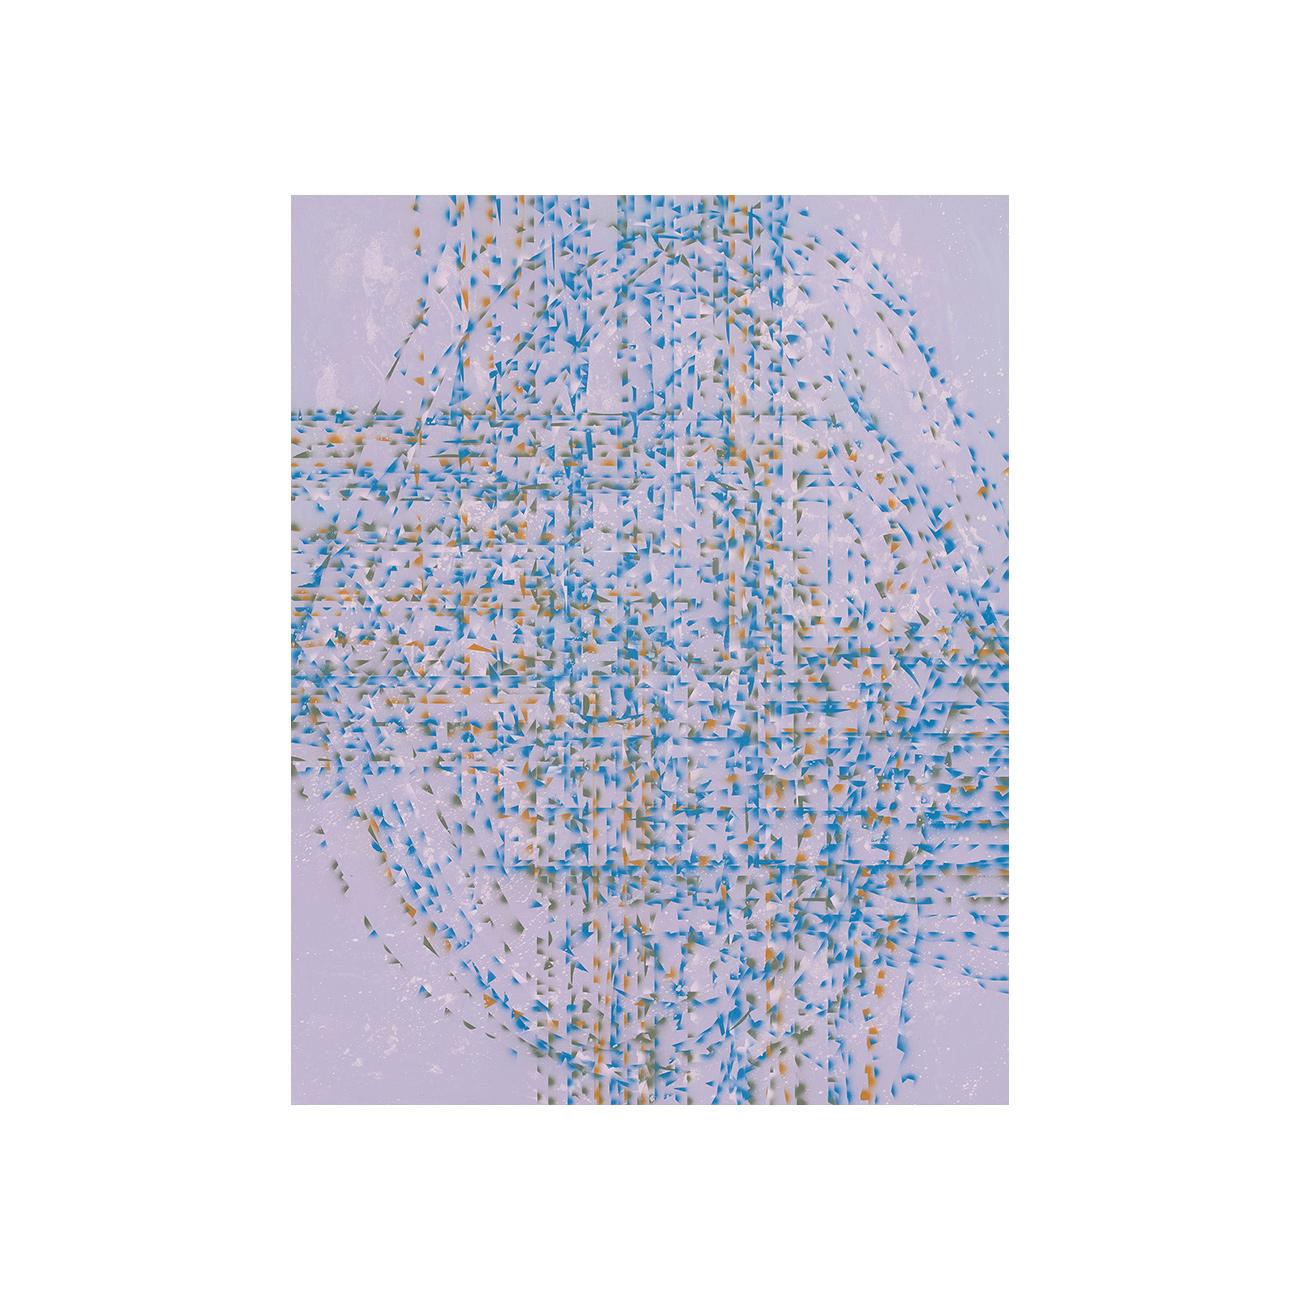 Horizont . 2019 . 95 x 75 cm . Acryl auf Baumwolle